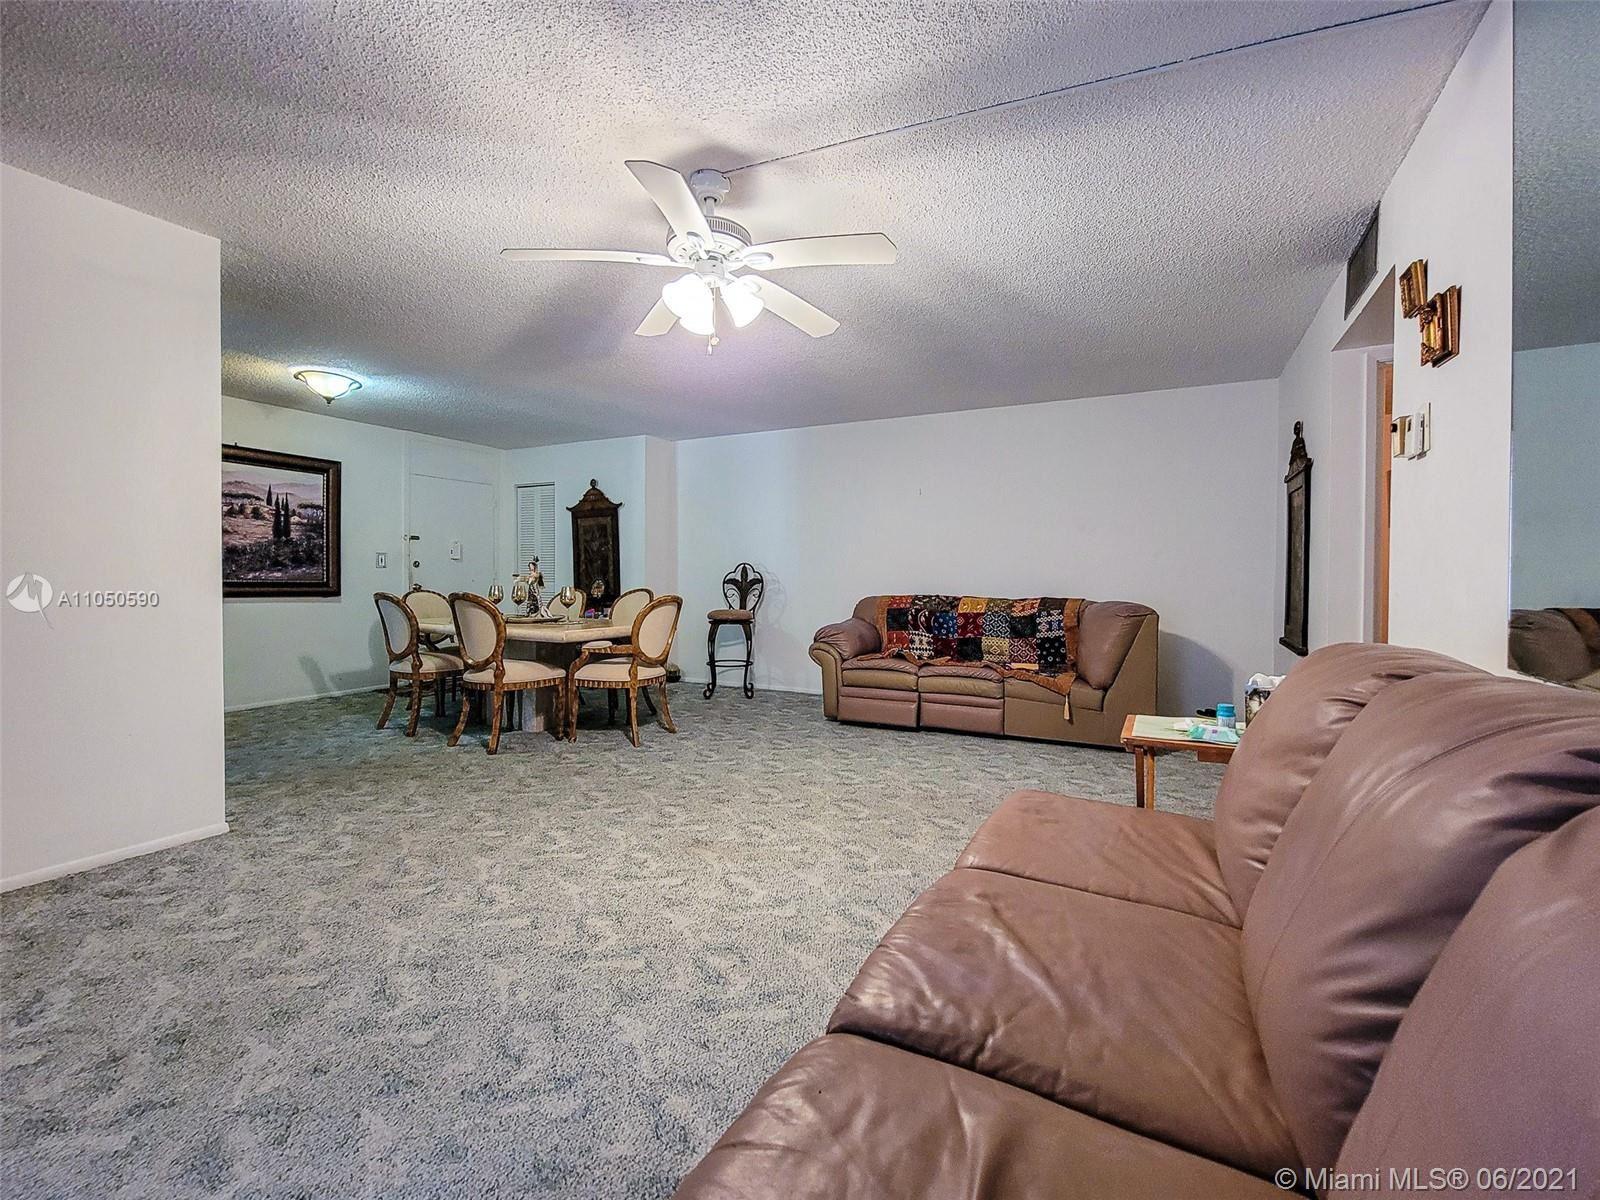 952 NE 199th St #3K (310), Miami, FL 33179 - #: A11050590